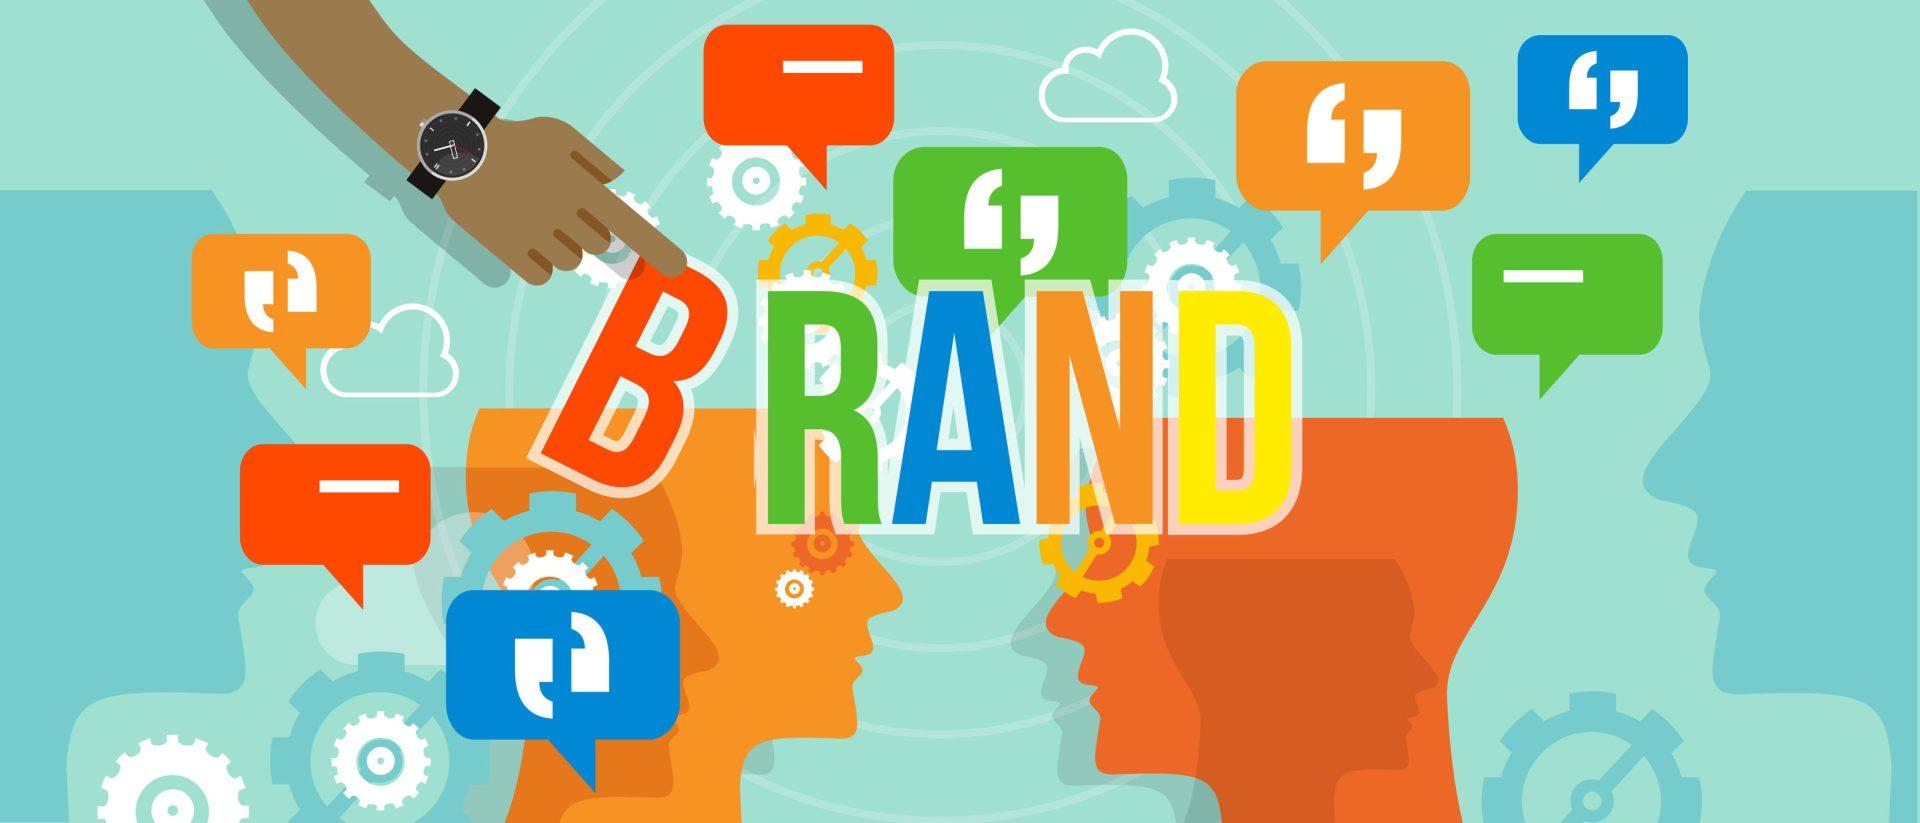 Branding in Relation to Advertising